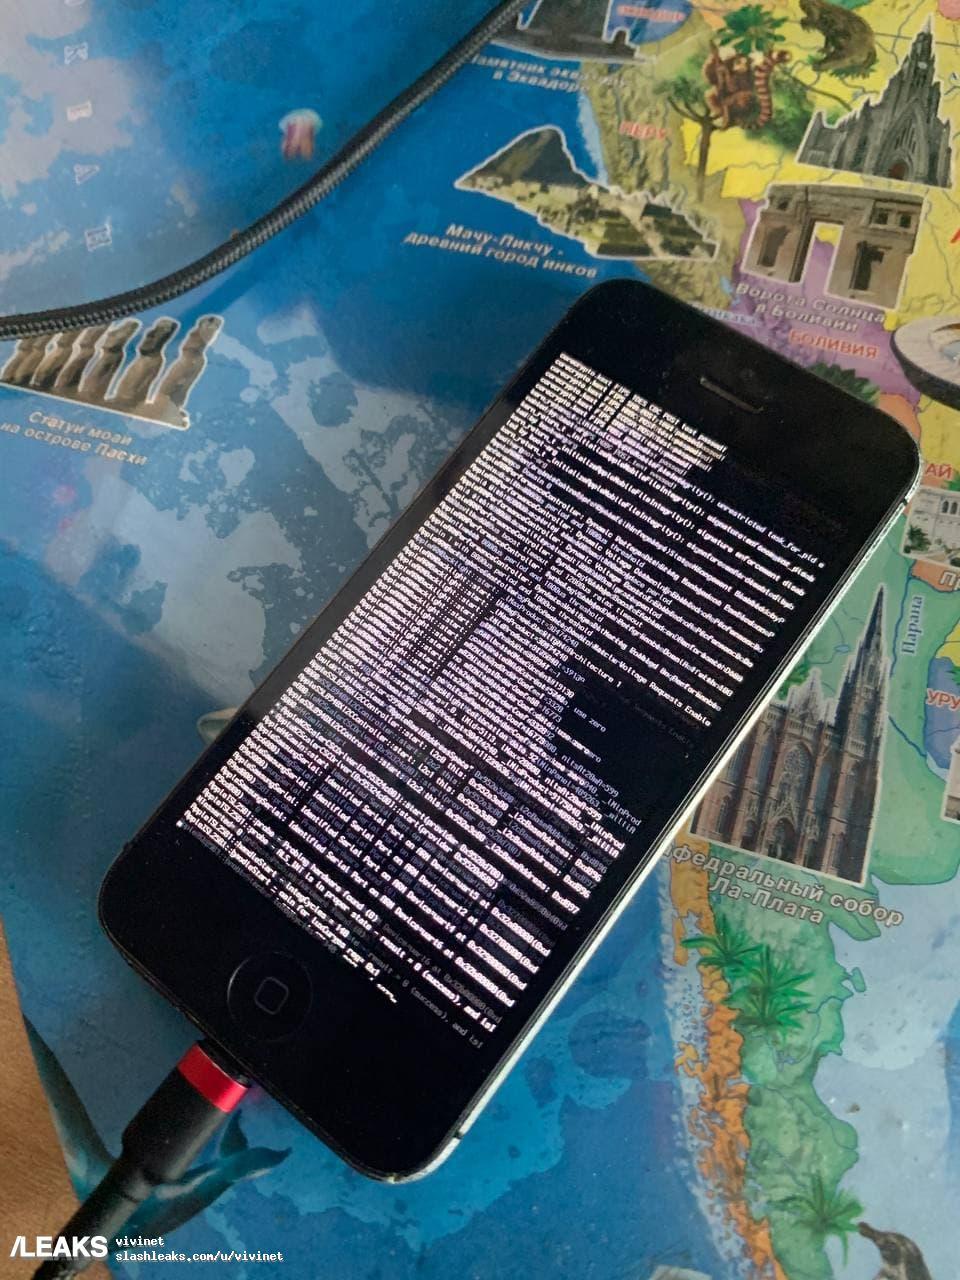 na_iphone_zapustili_android_s_obolochkoj_miui_video_1